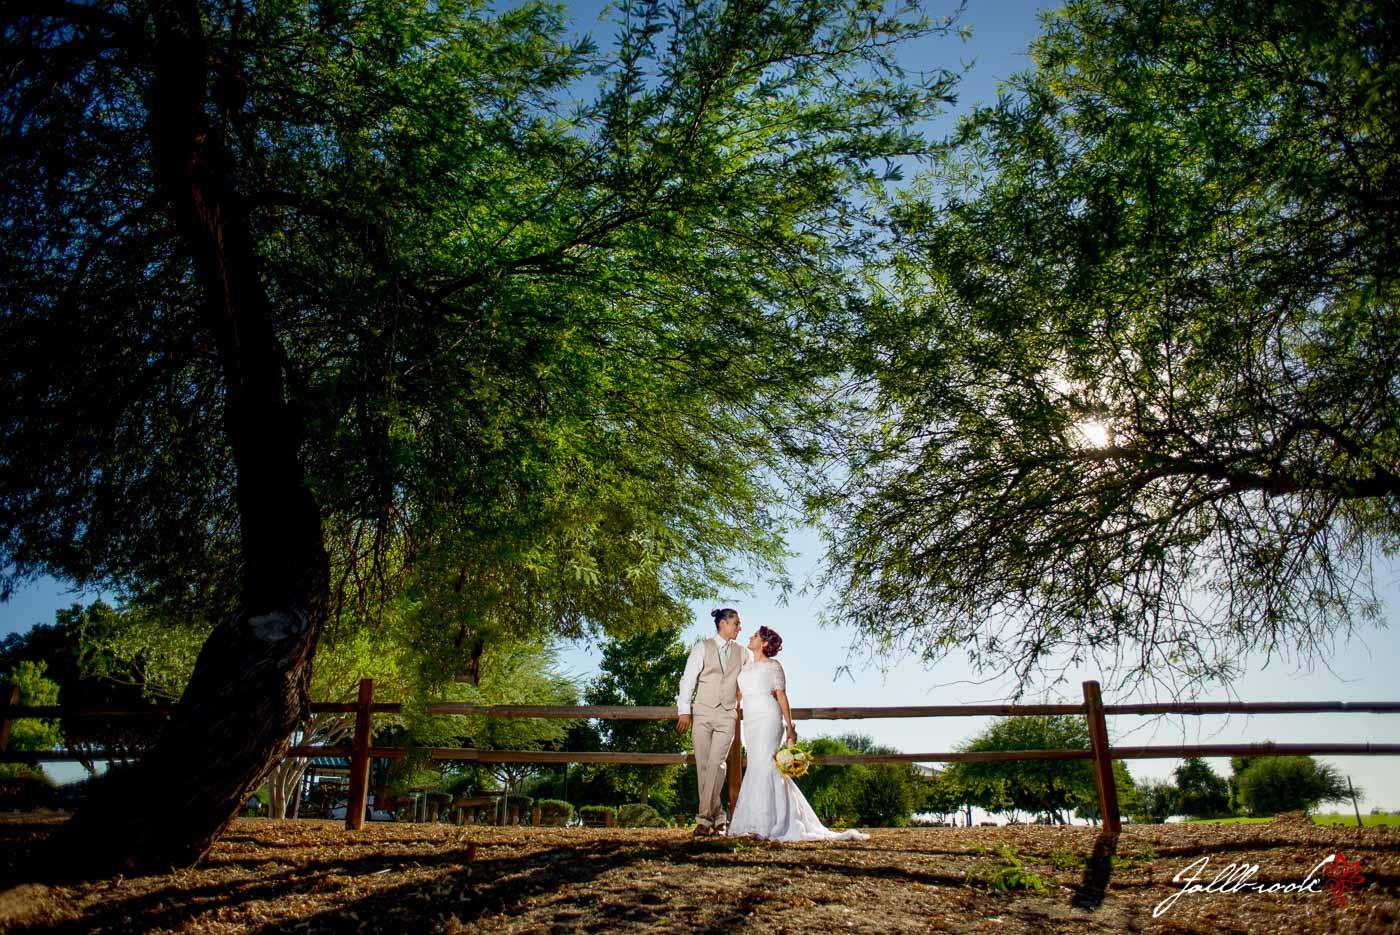 Fallbrook Photography